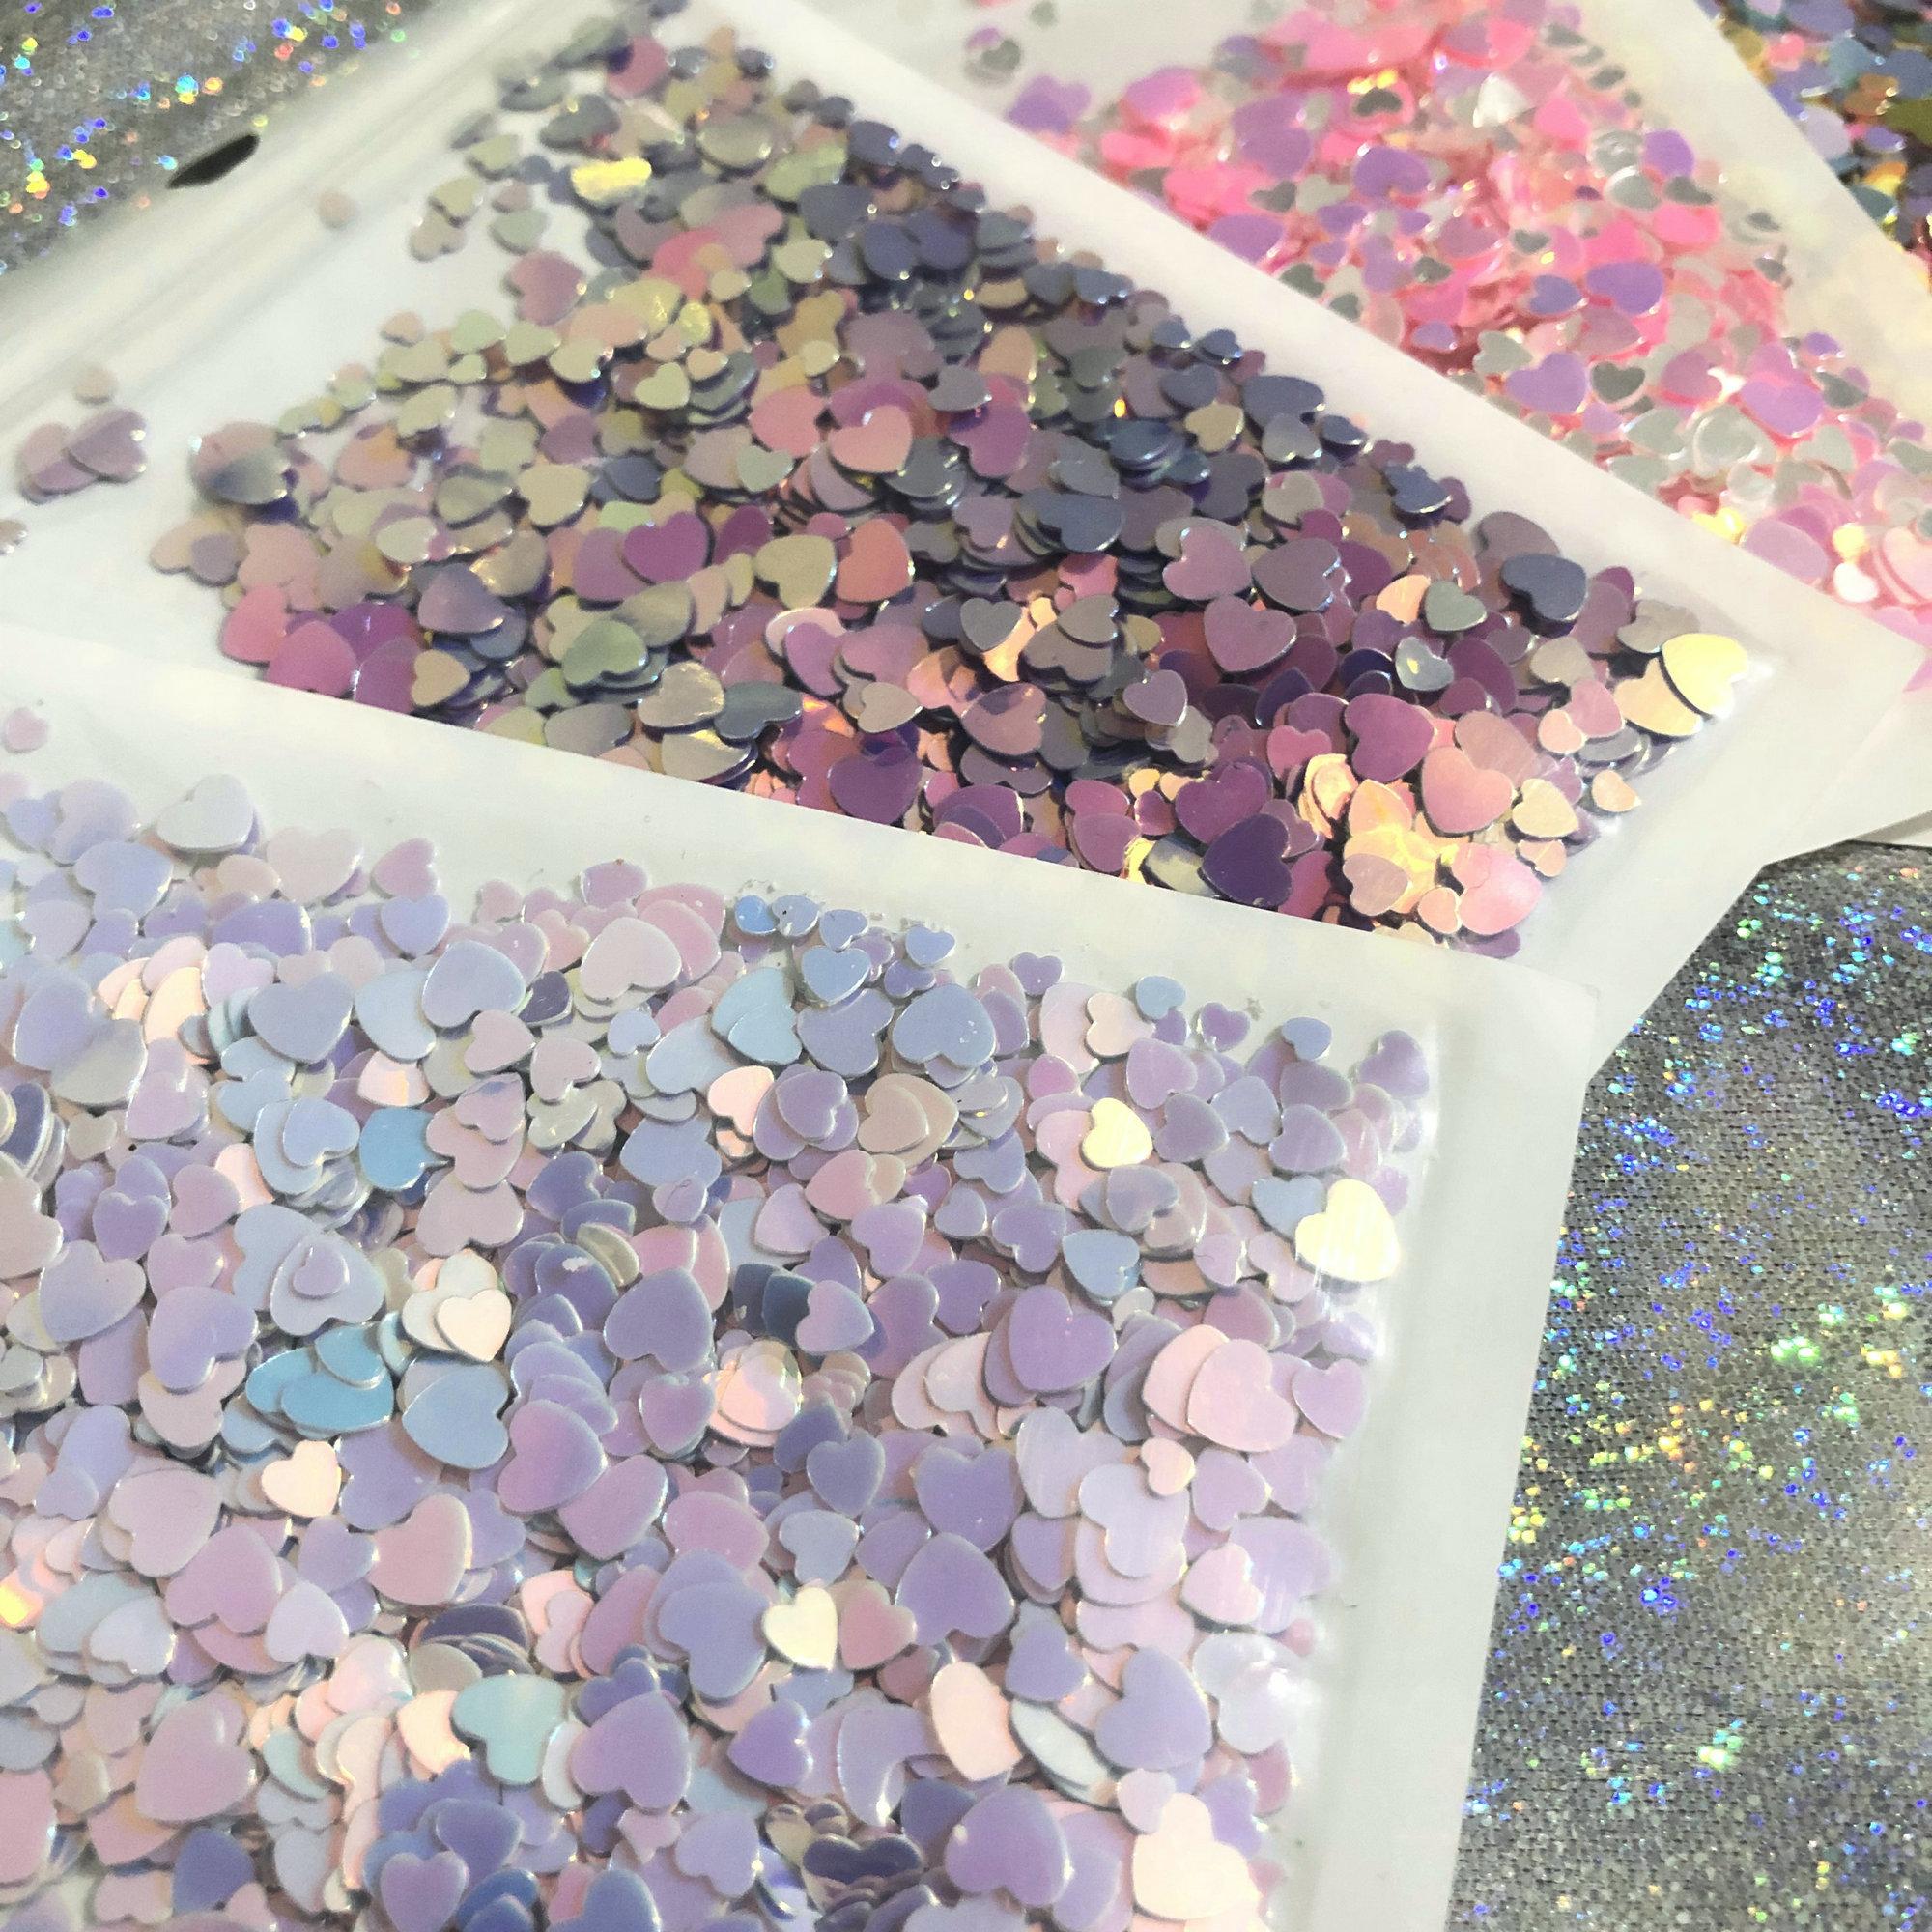 Corazón brillante lentejuelas tamaño mezcla DIY resina Shaker Charms rellenos brillantes holográfico abultado corazón cortes decoración brillo Paillette Slime